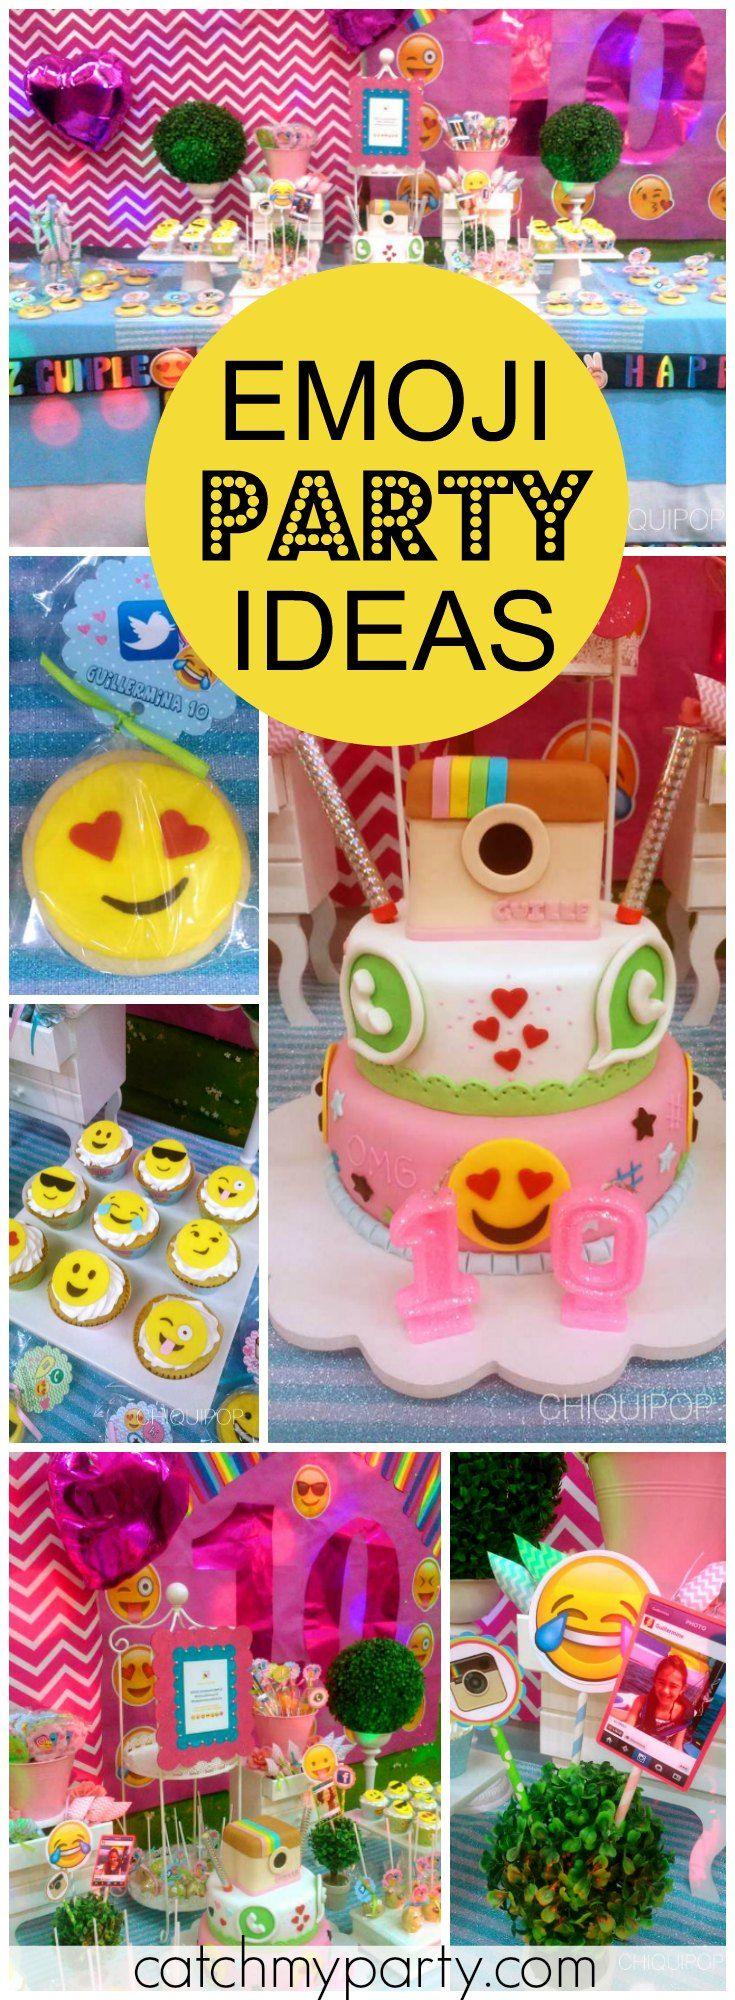 insta face emoji birthday a fun holiday for guillermina s 10th